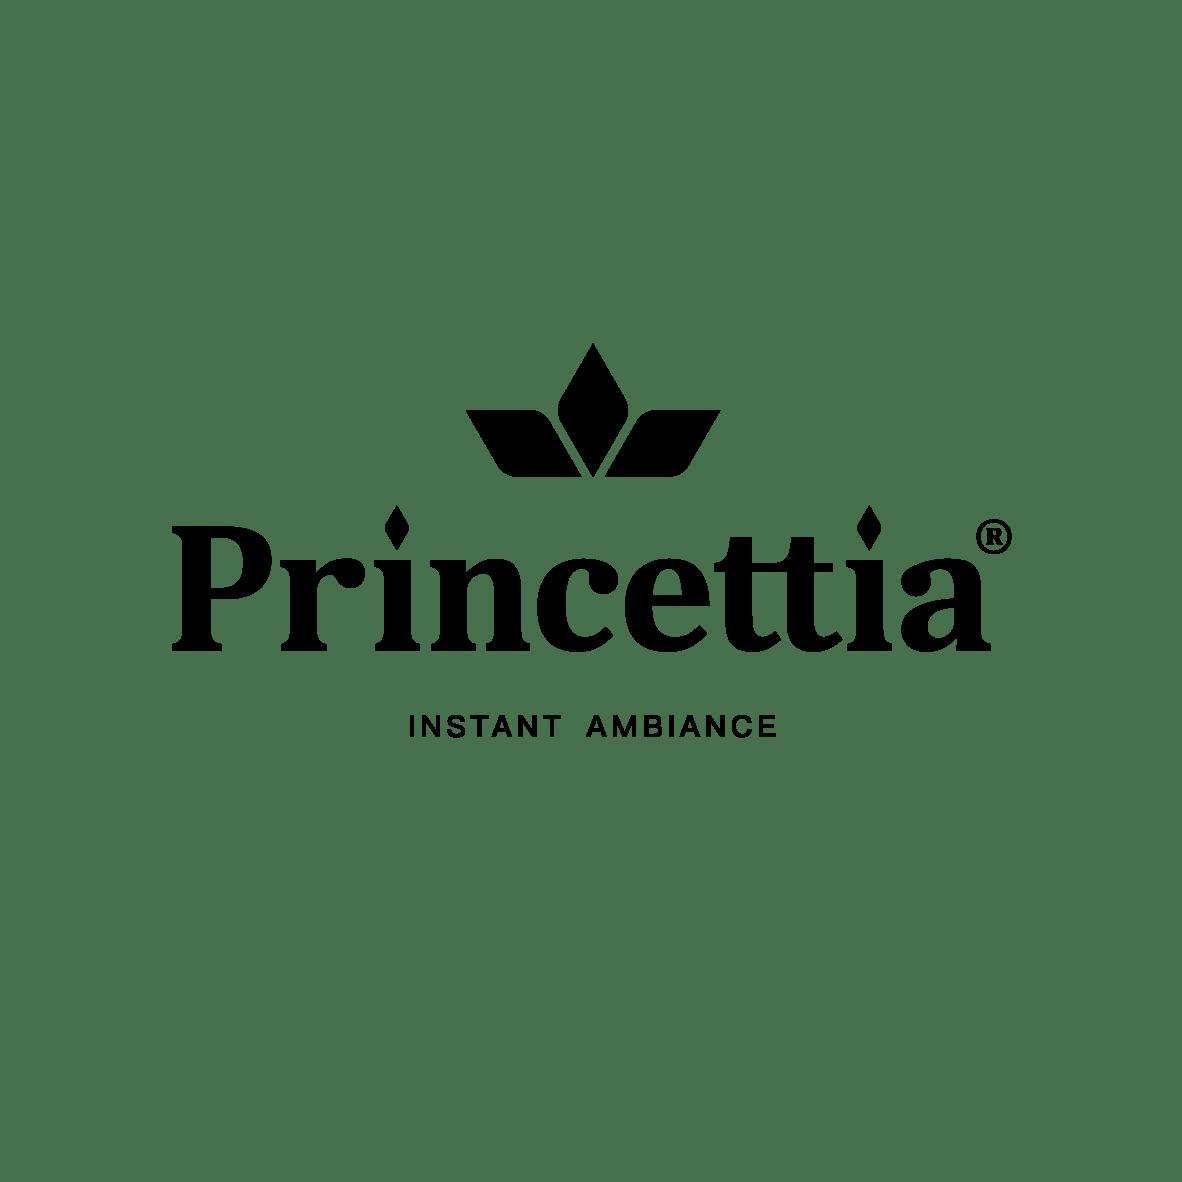 Princettia logo black